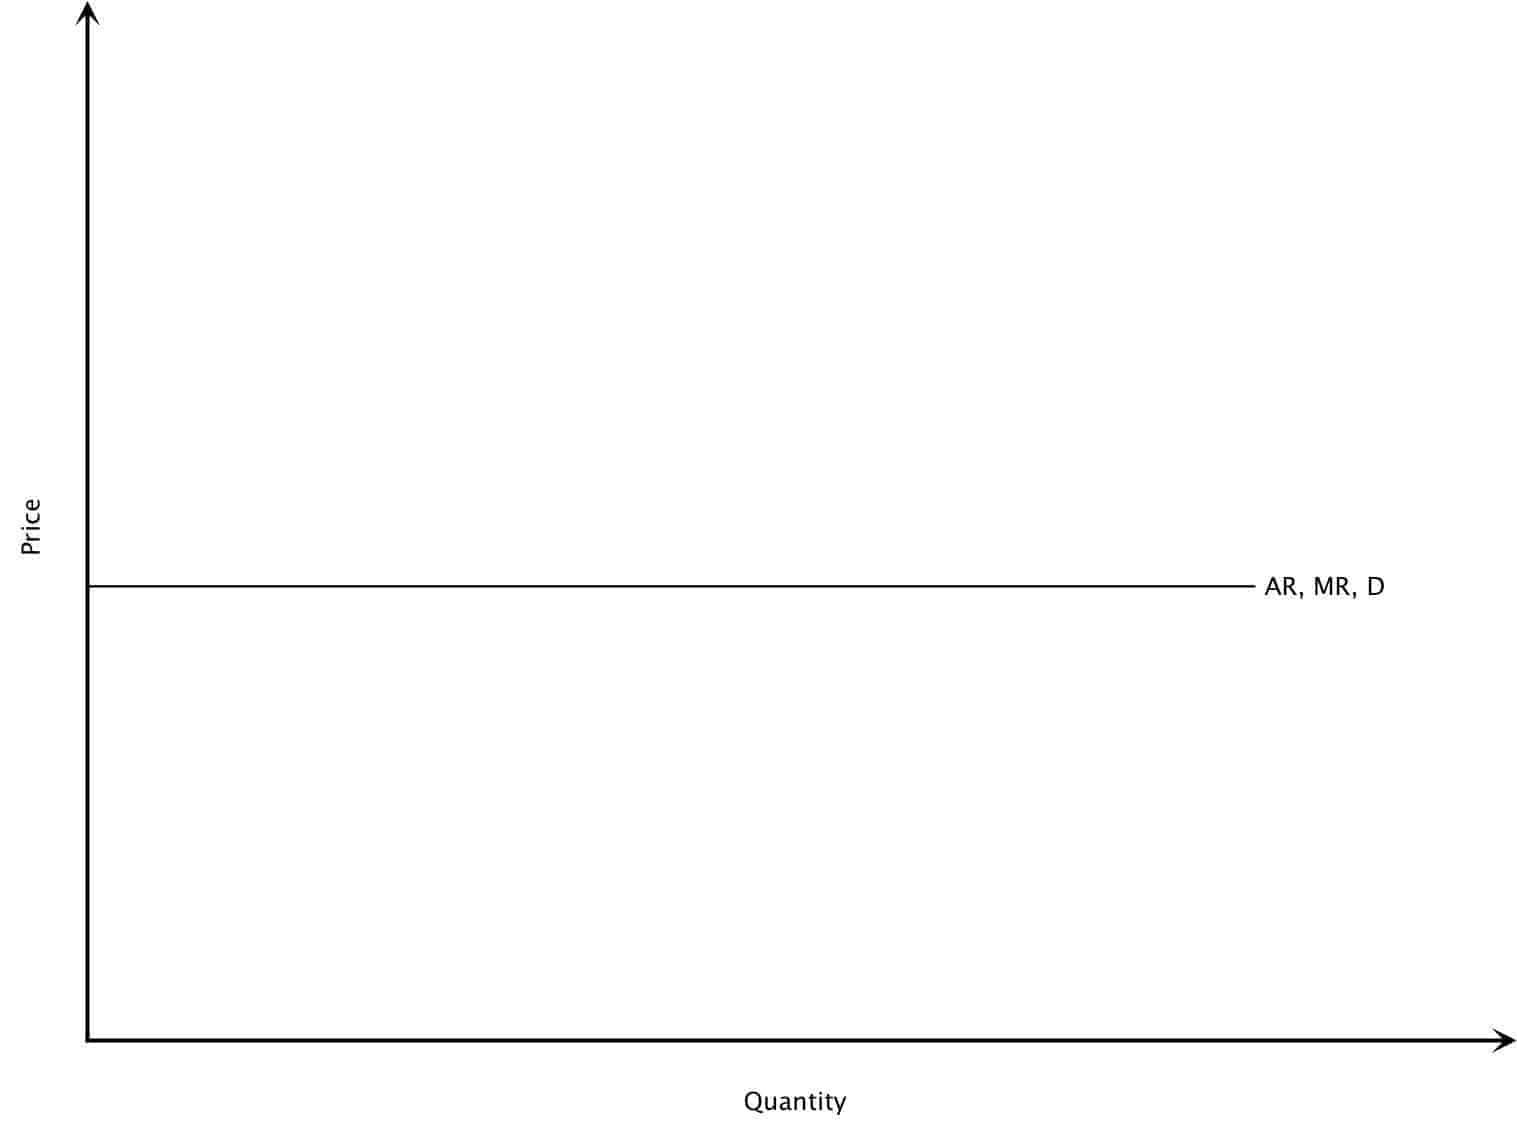 Average Marginal Revenue Curve for Perfect Competition